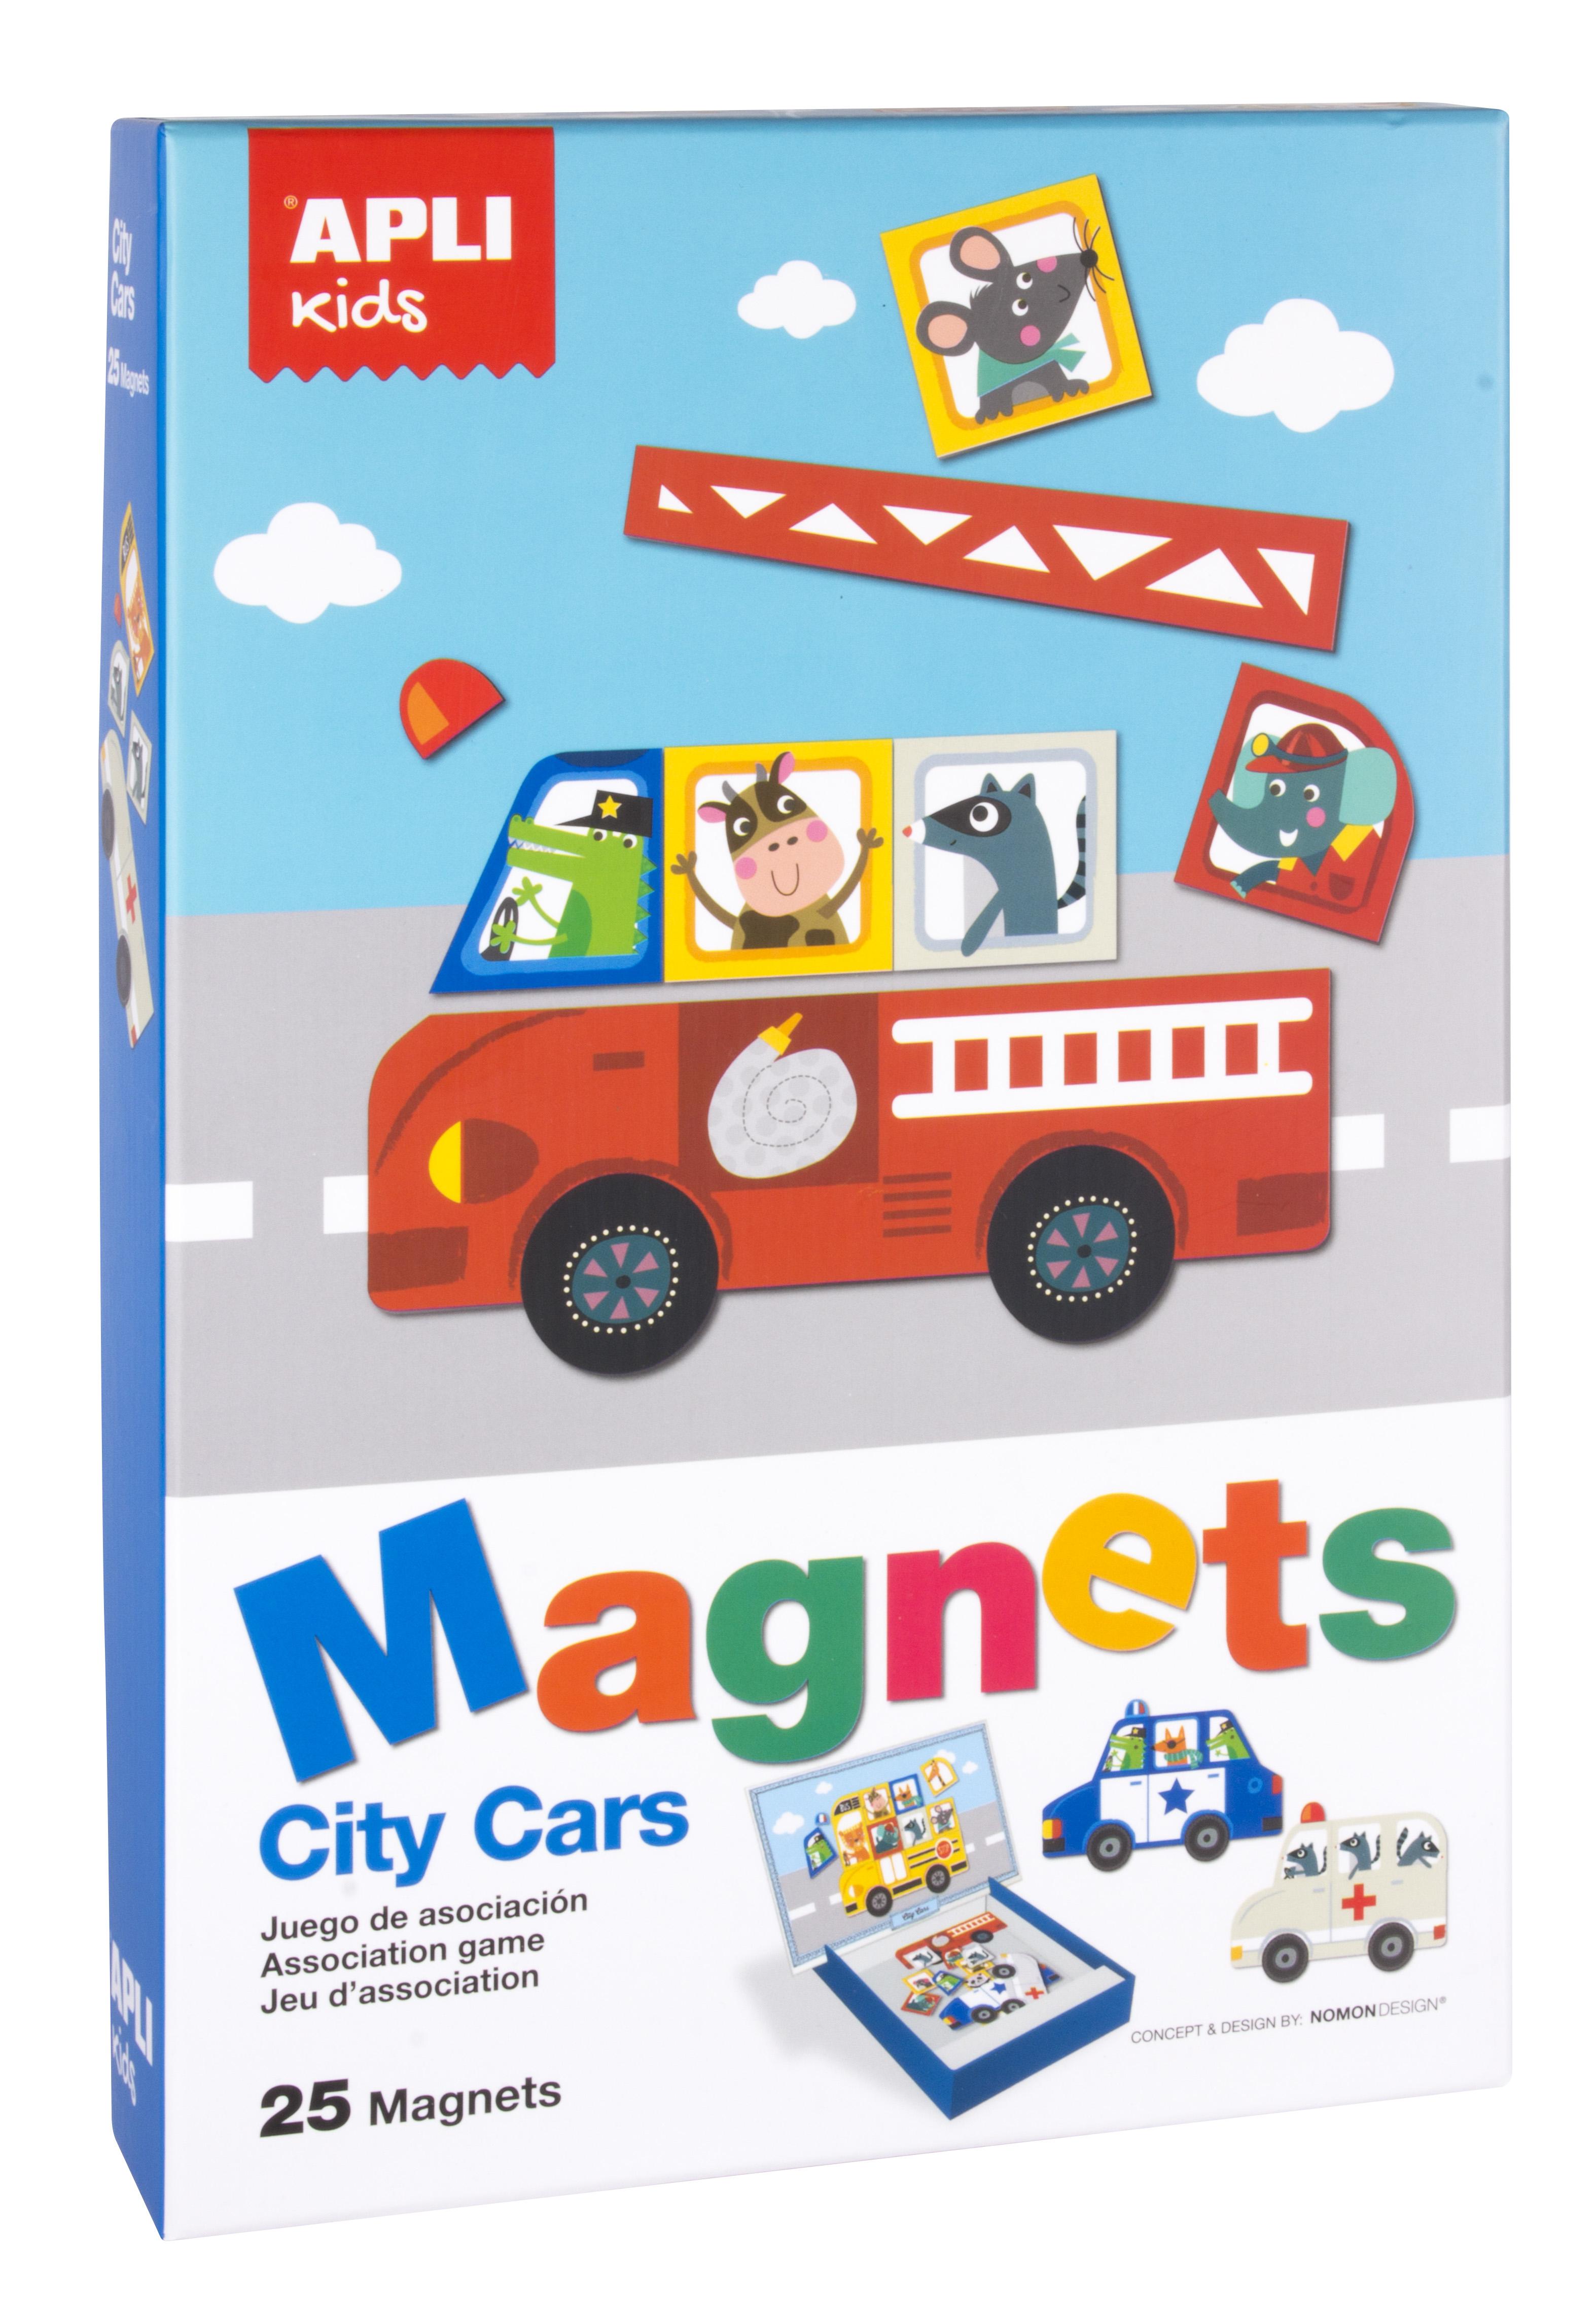 Автомобилите в града - образователна игра с магнити от Apli Kids - образователни играчки-bellamiestore